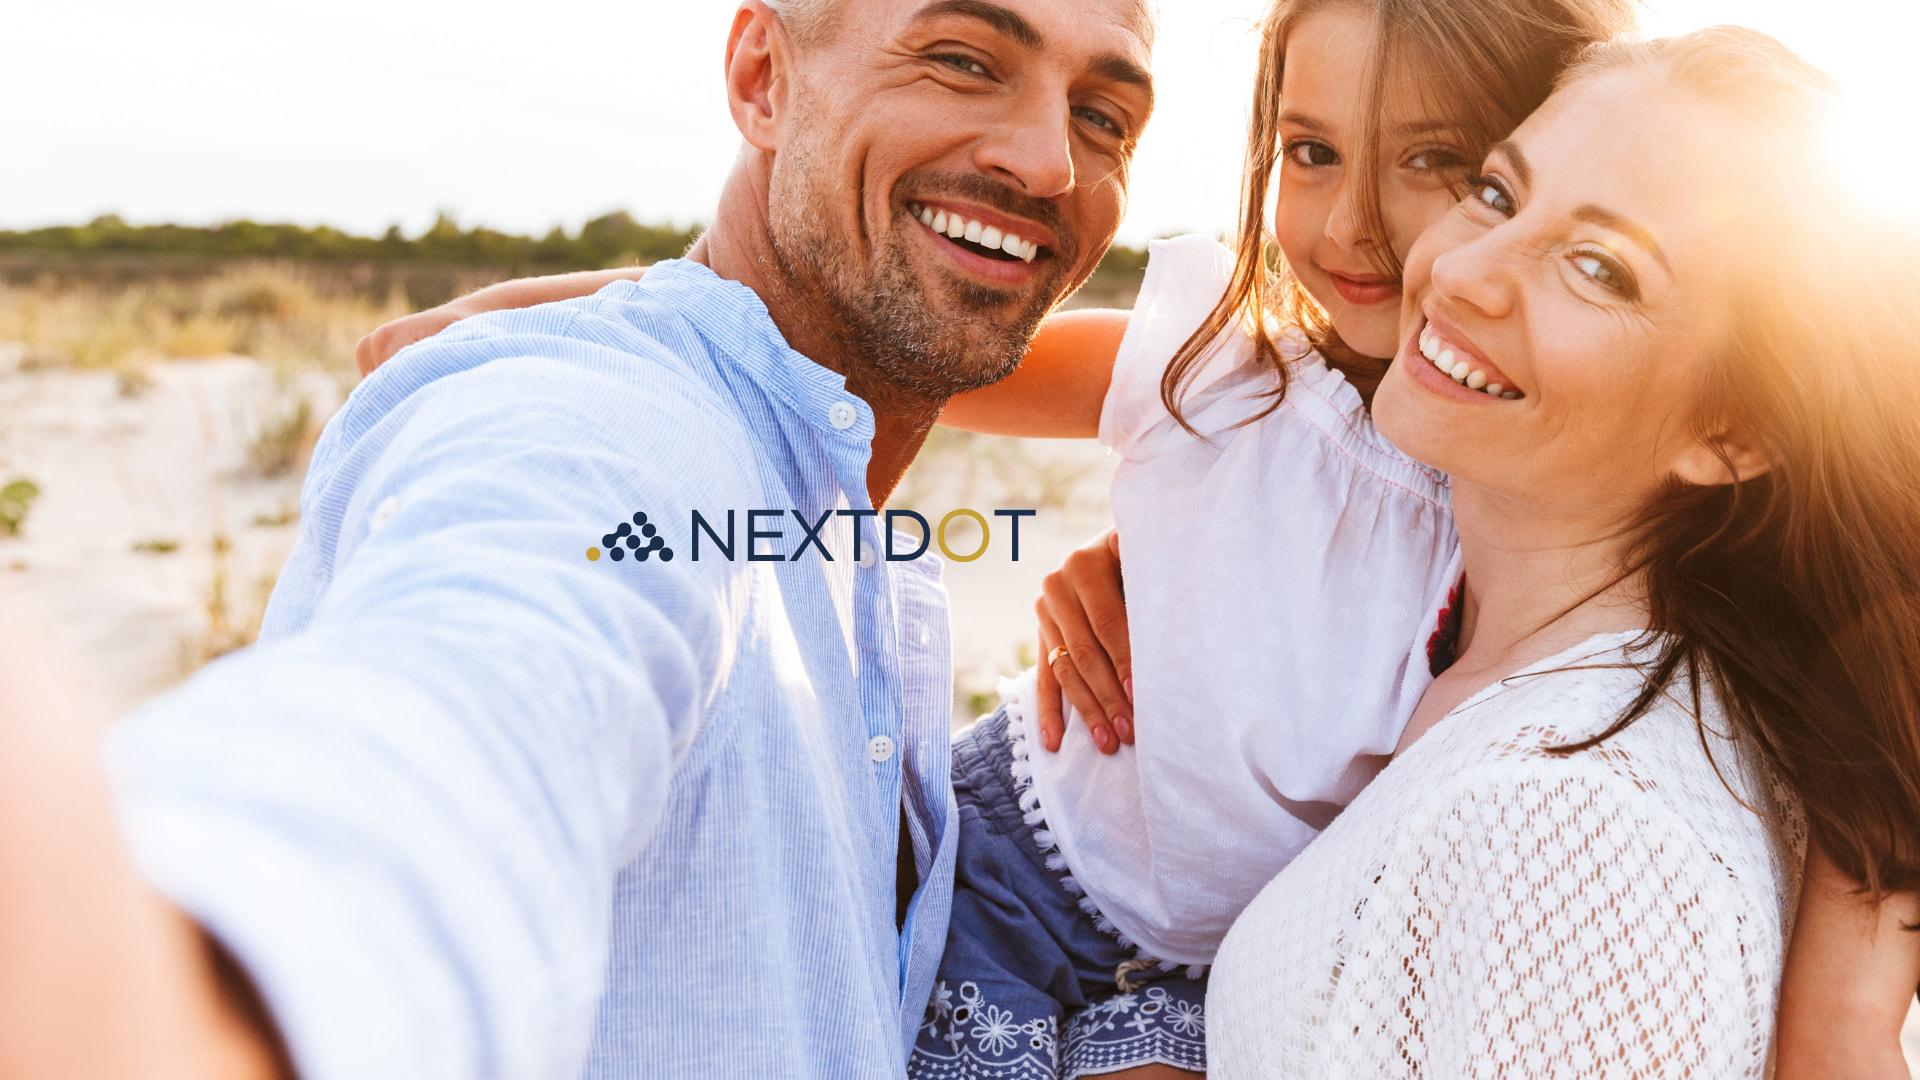 Interakt Client background - NextDot